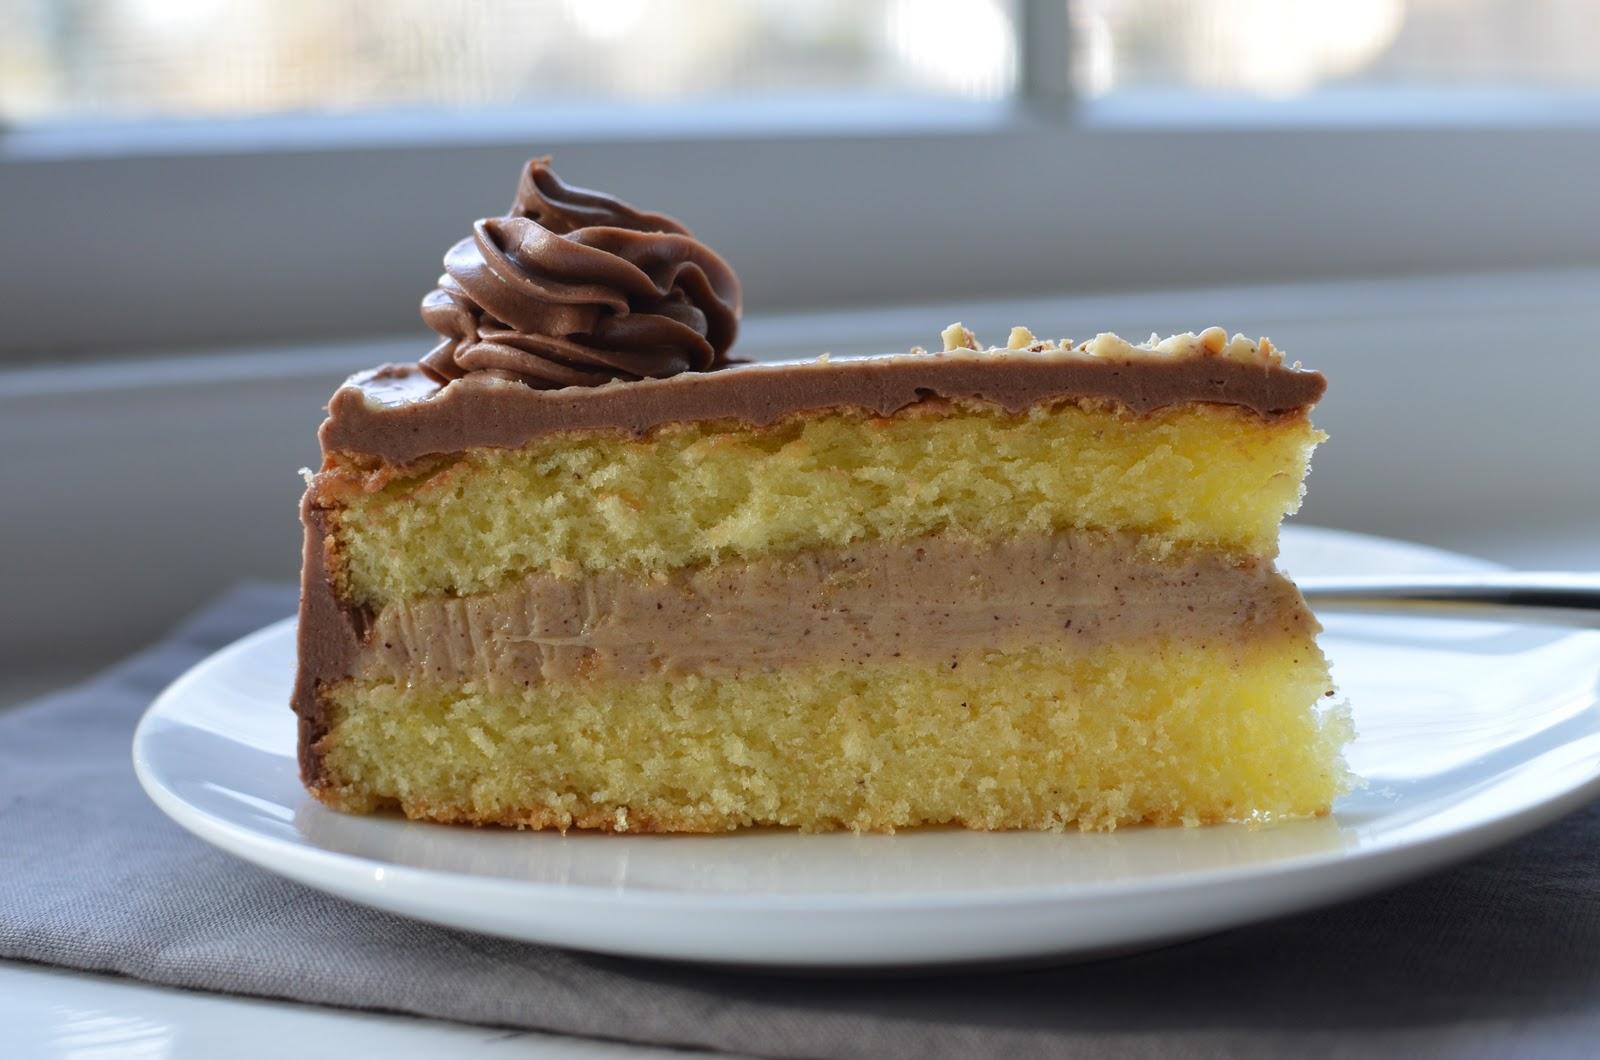 Chocolate Praline Cake Filling